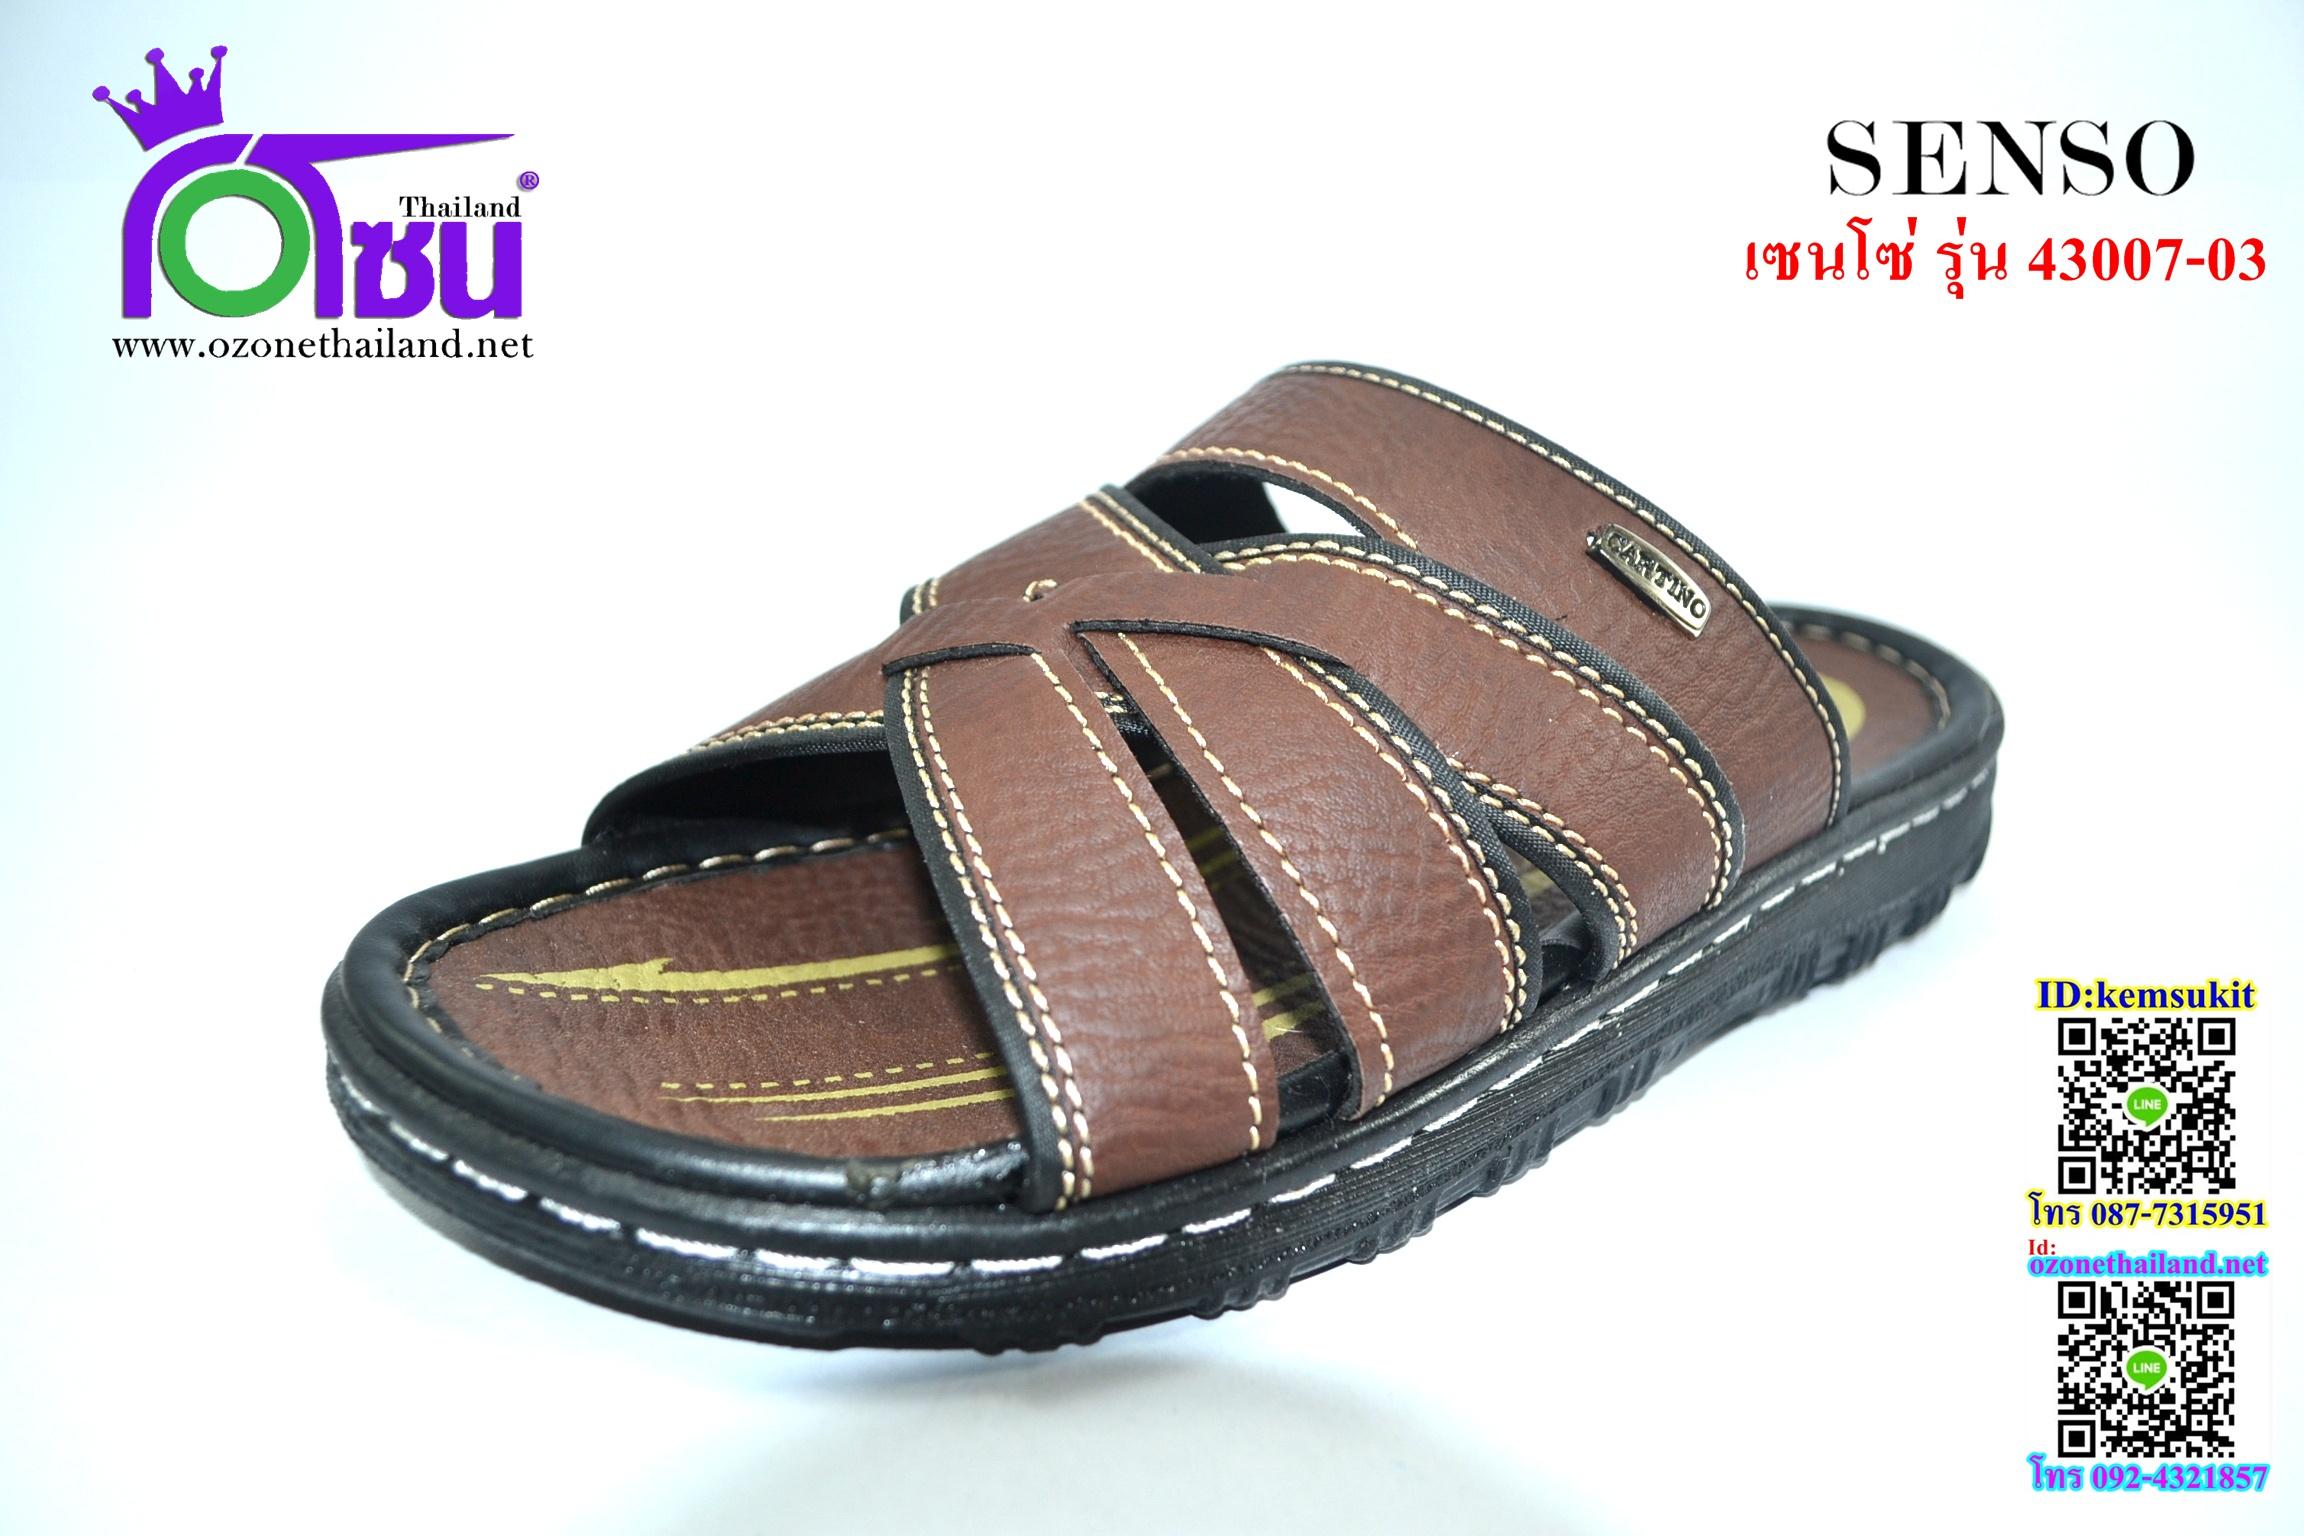 senso (เซนโซ) สีน้ำตาล รุ่นNE43007-03 เบอร์40-44